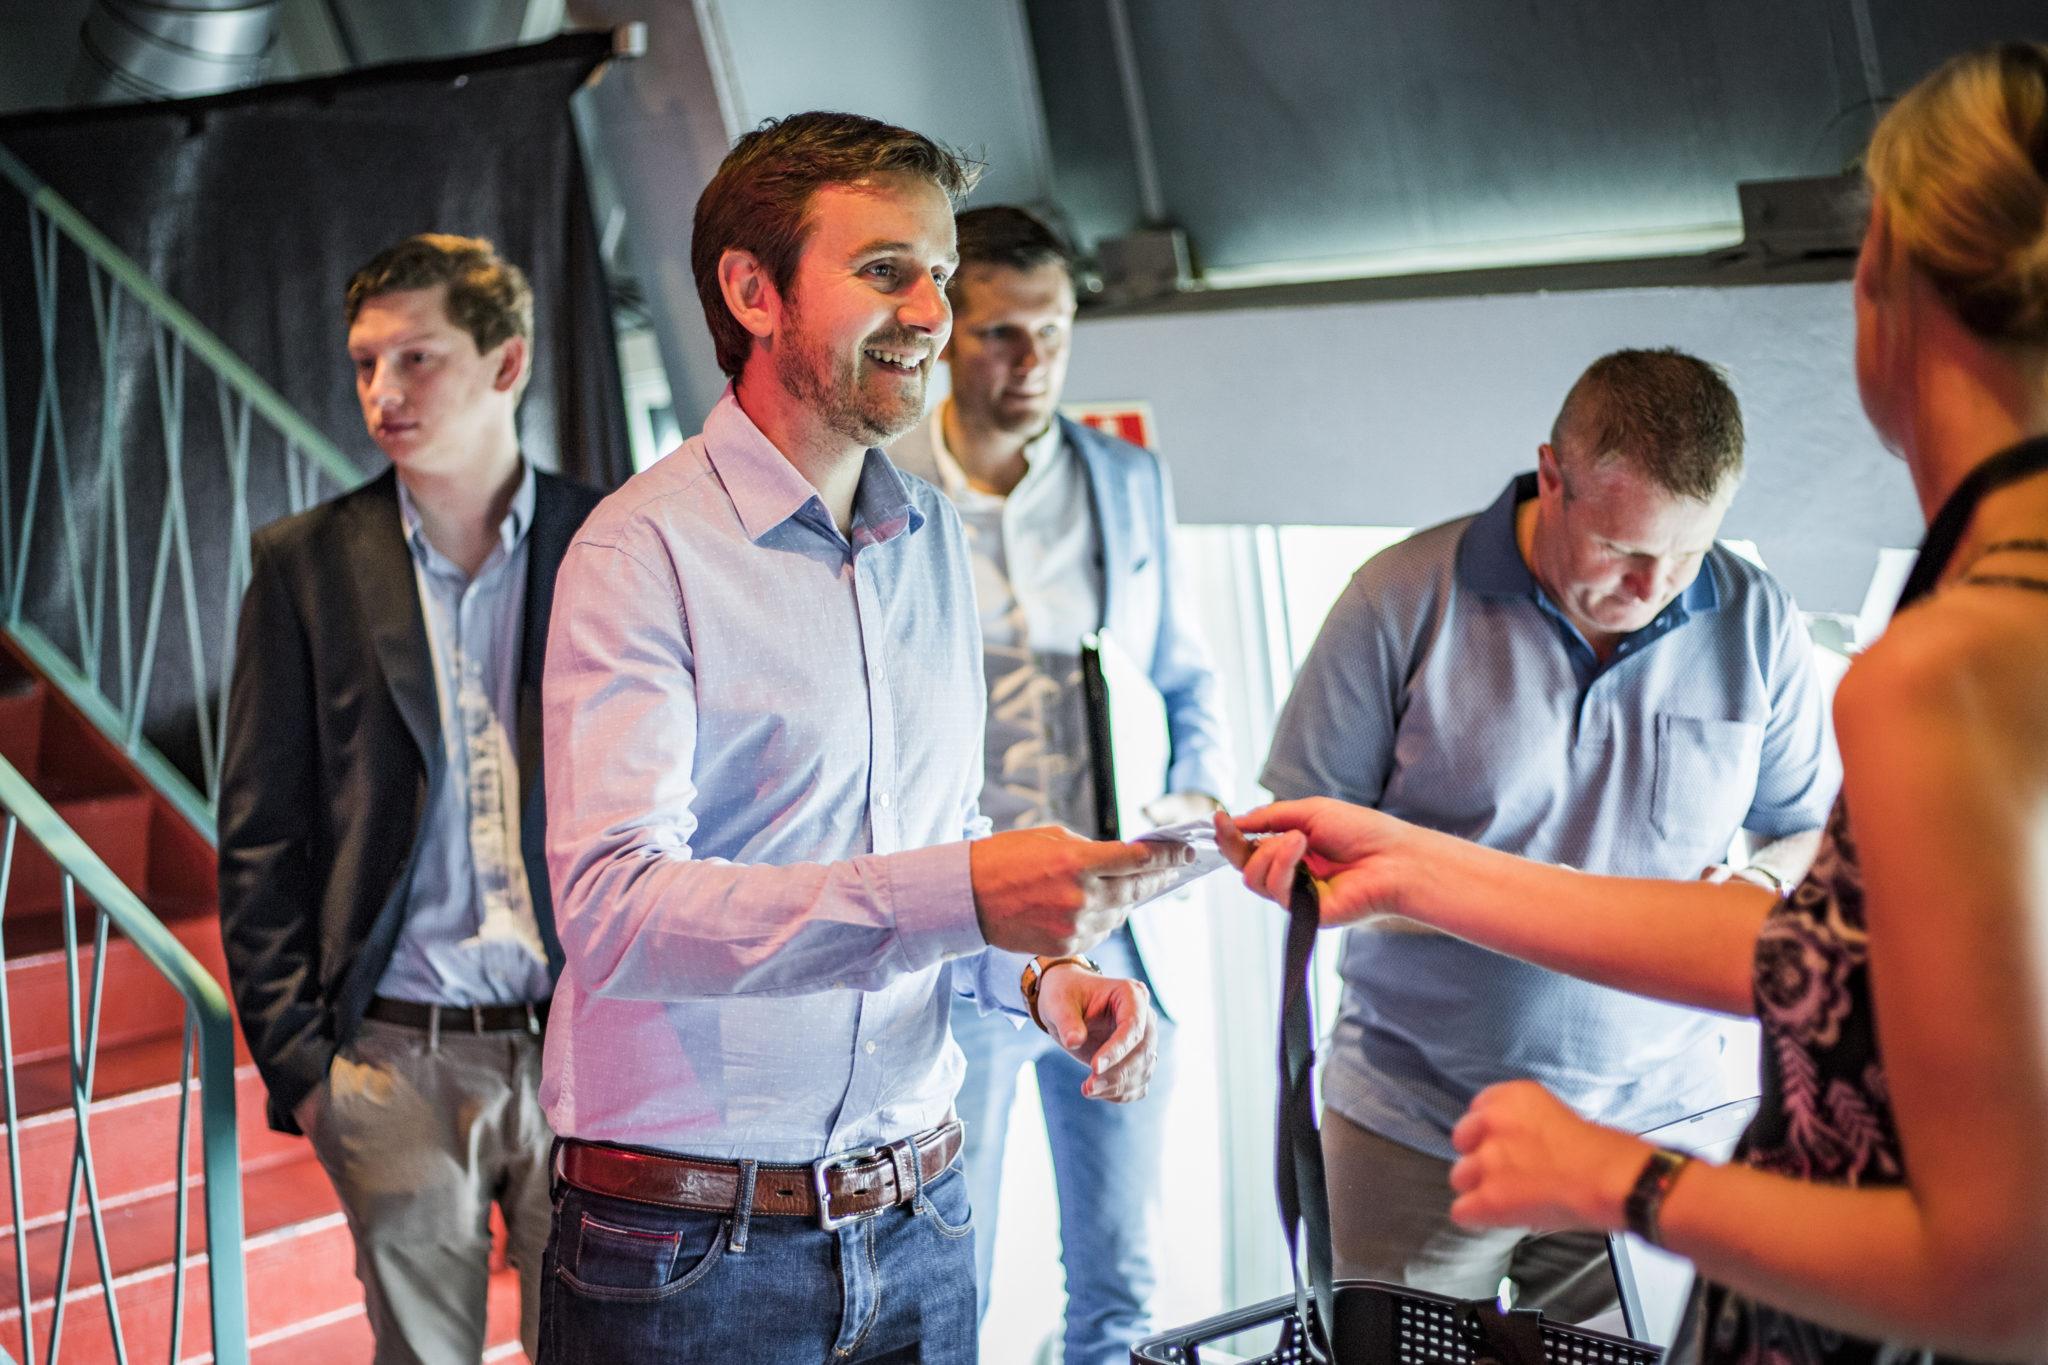 EPU_VIGC_Benelux Online Print Event 2018_SE_03